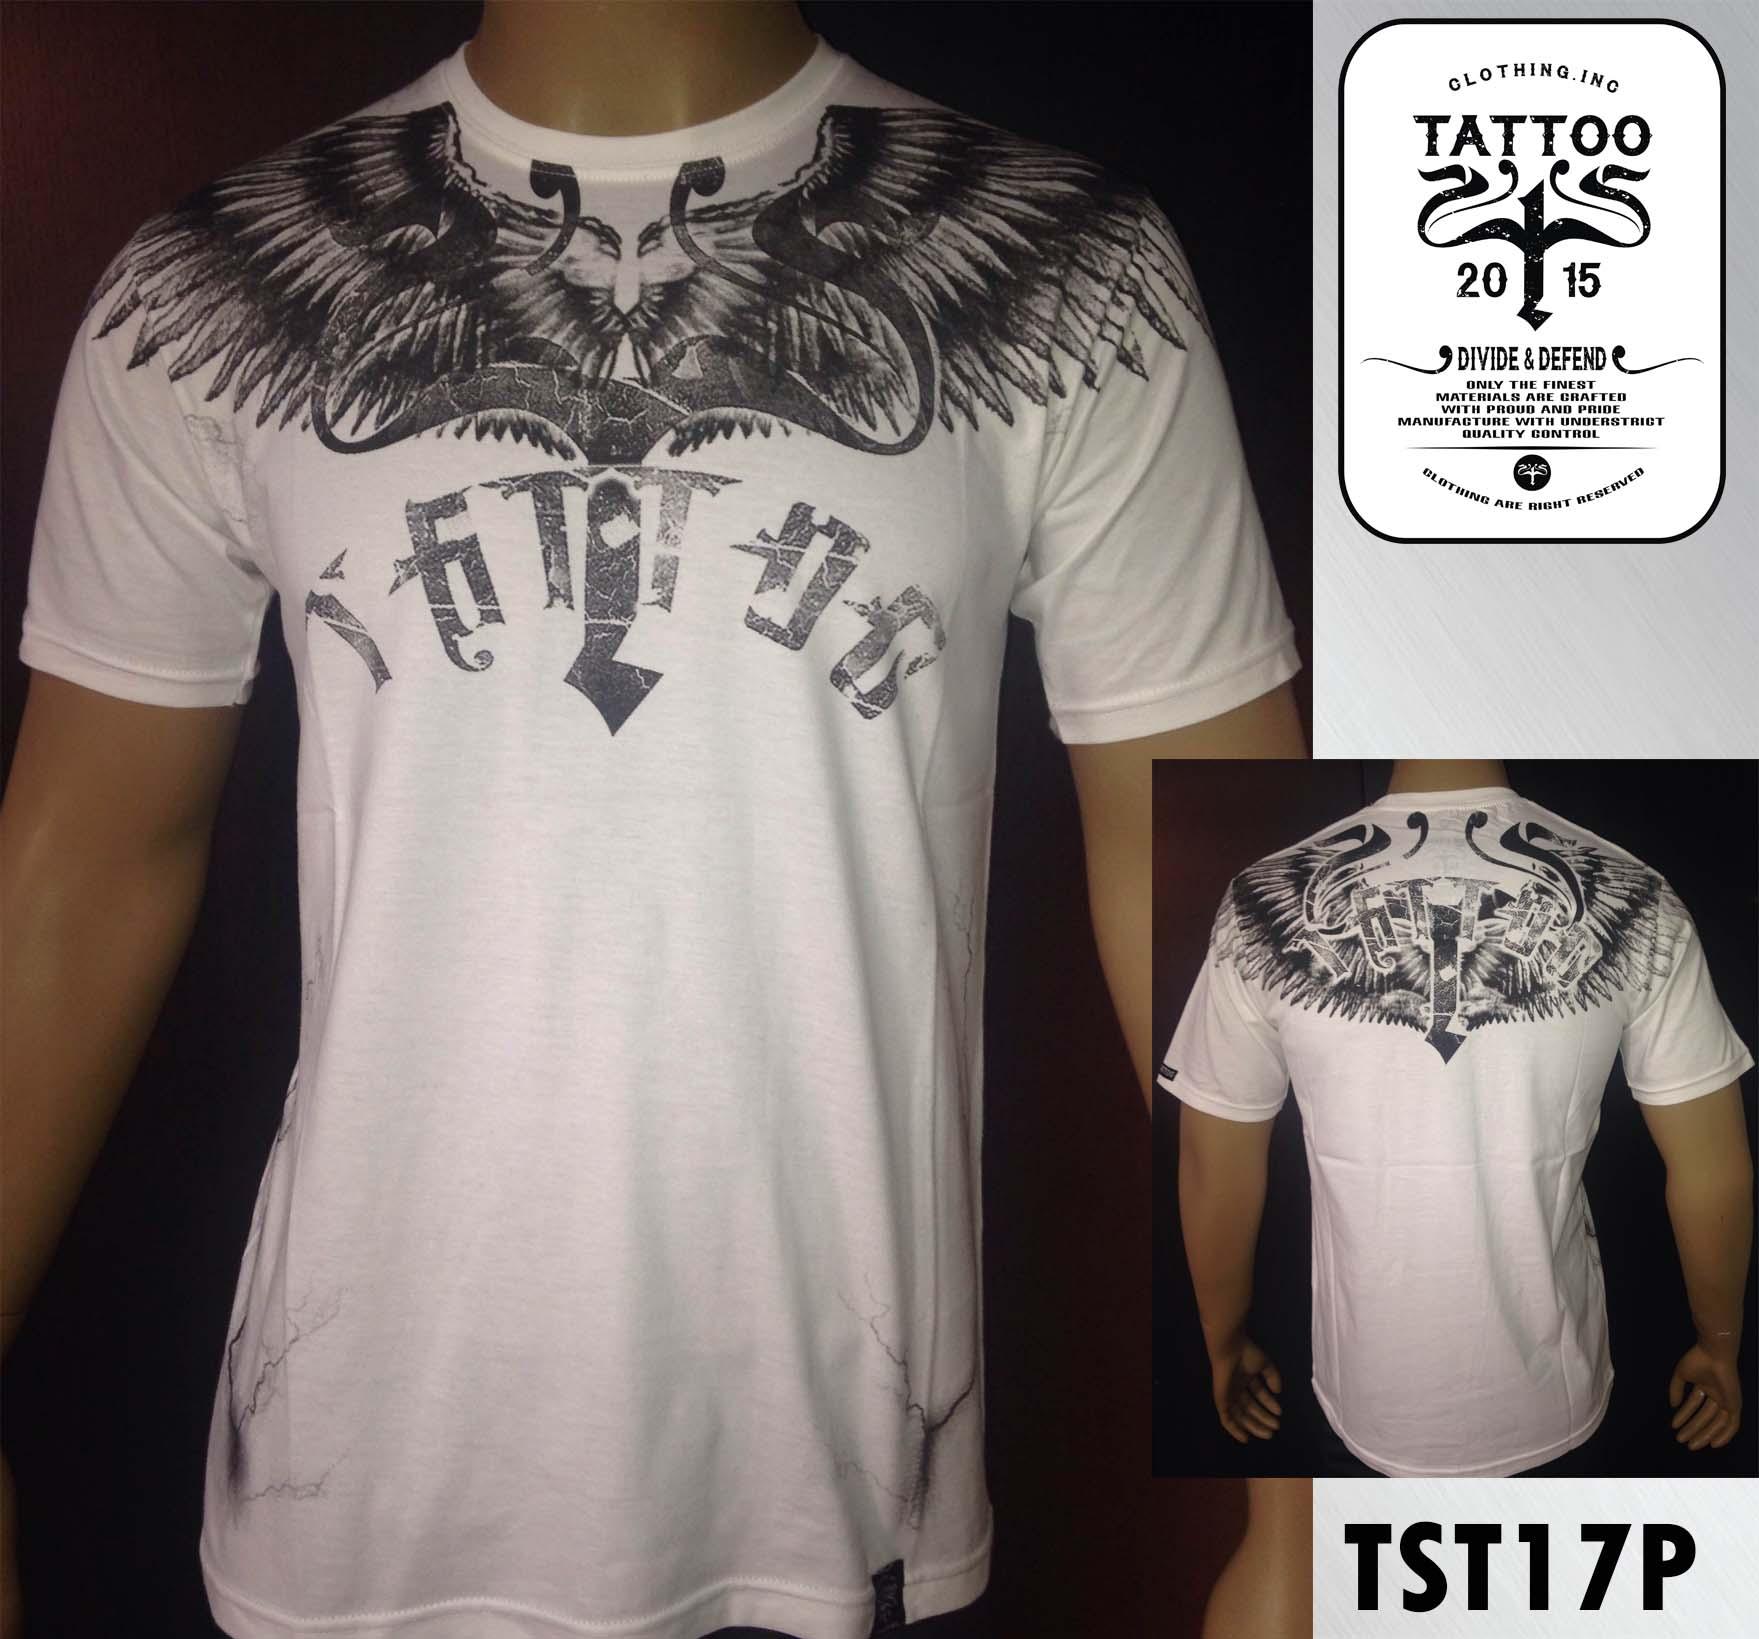 Kaos Distro Tatto Original Wonebi Berkualitas Harga Murah